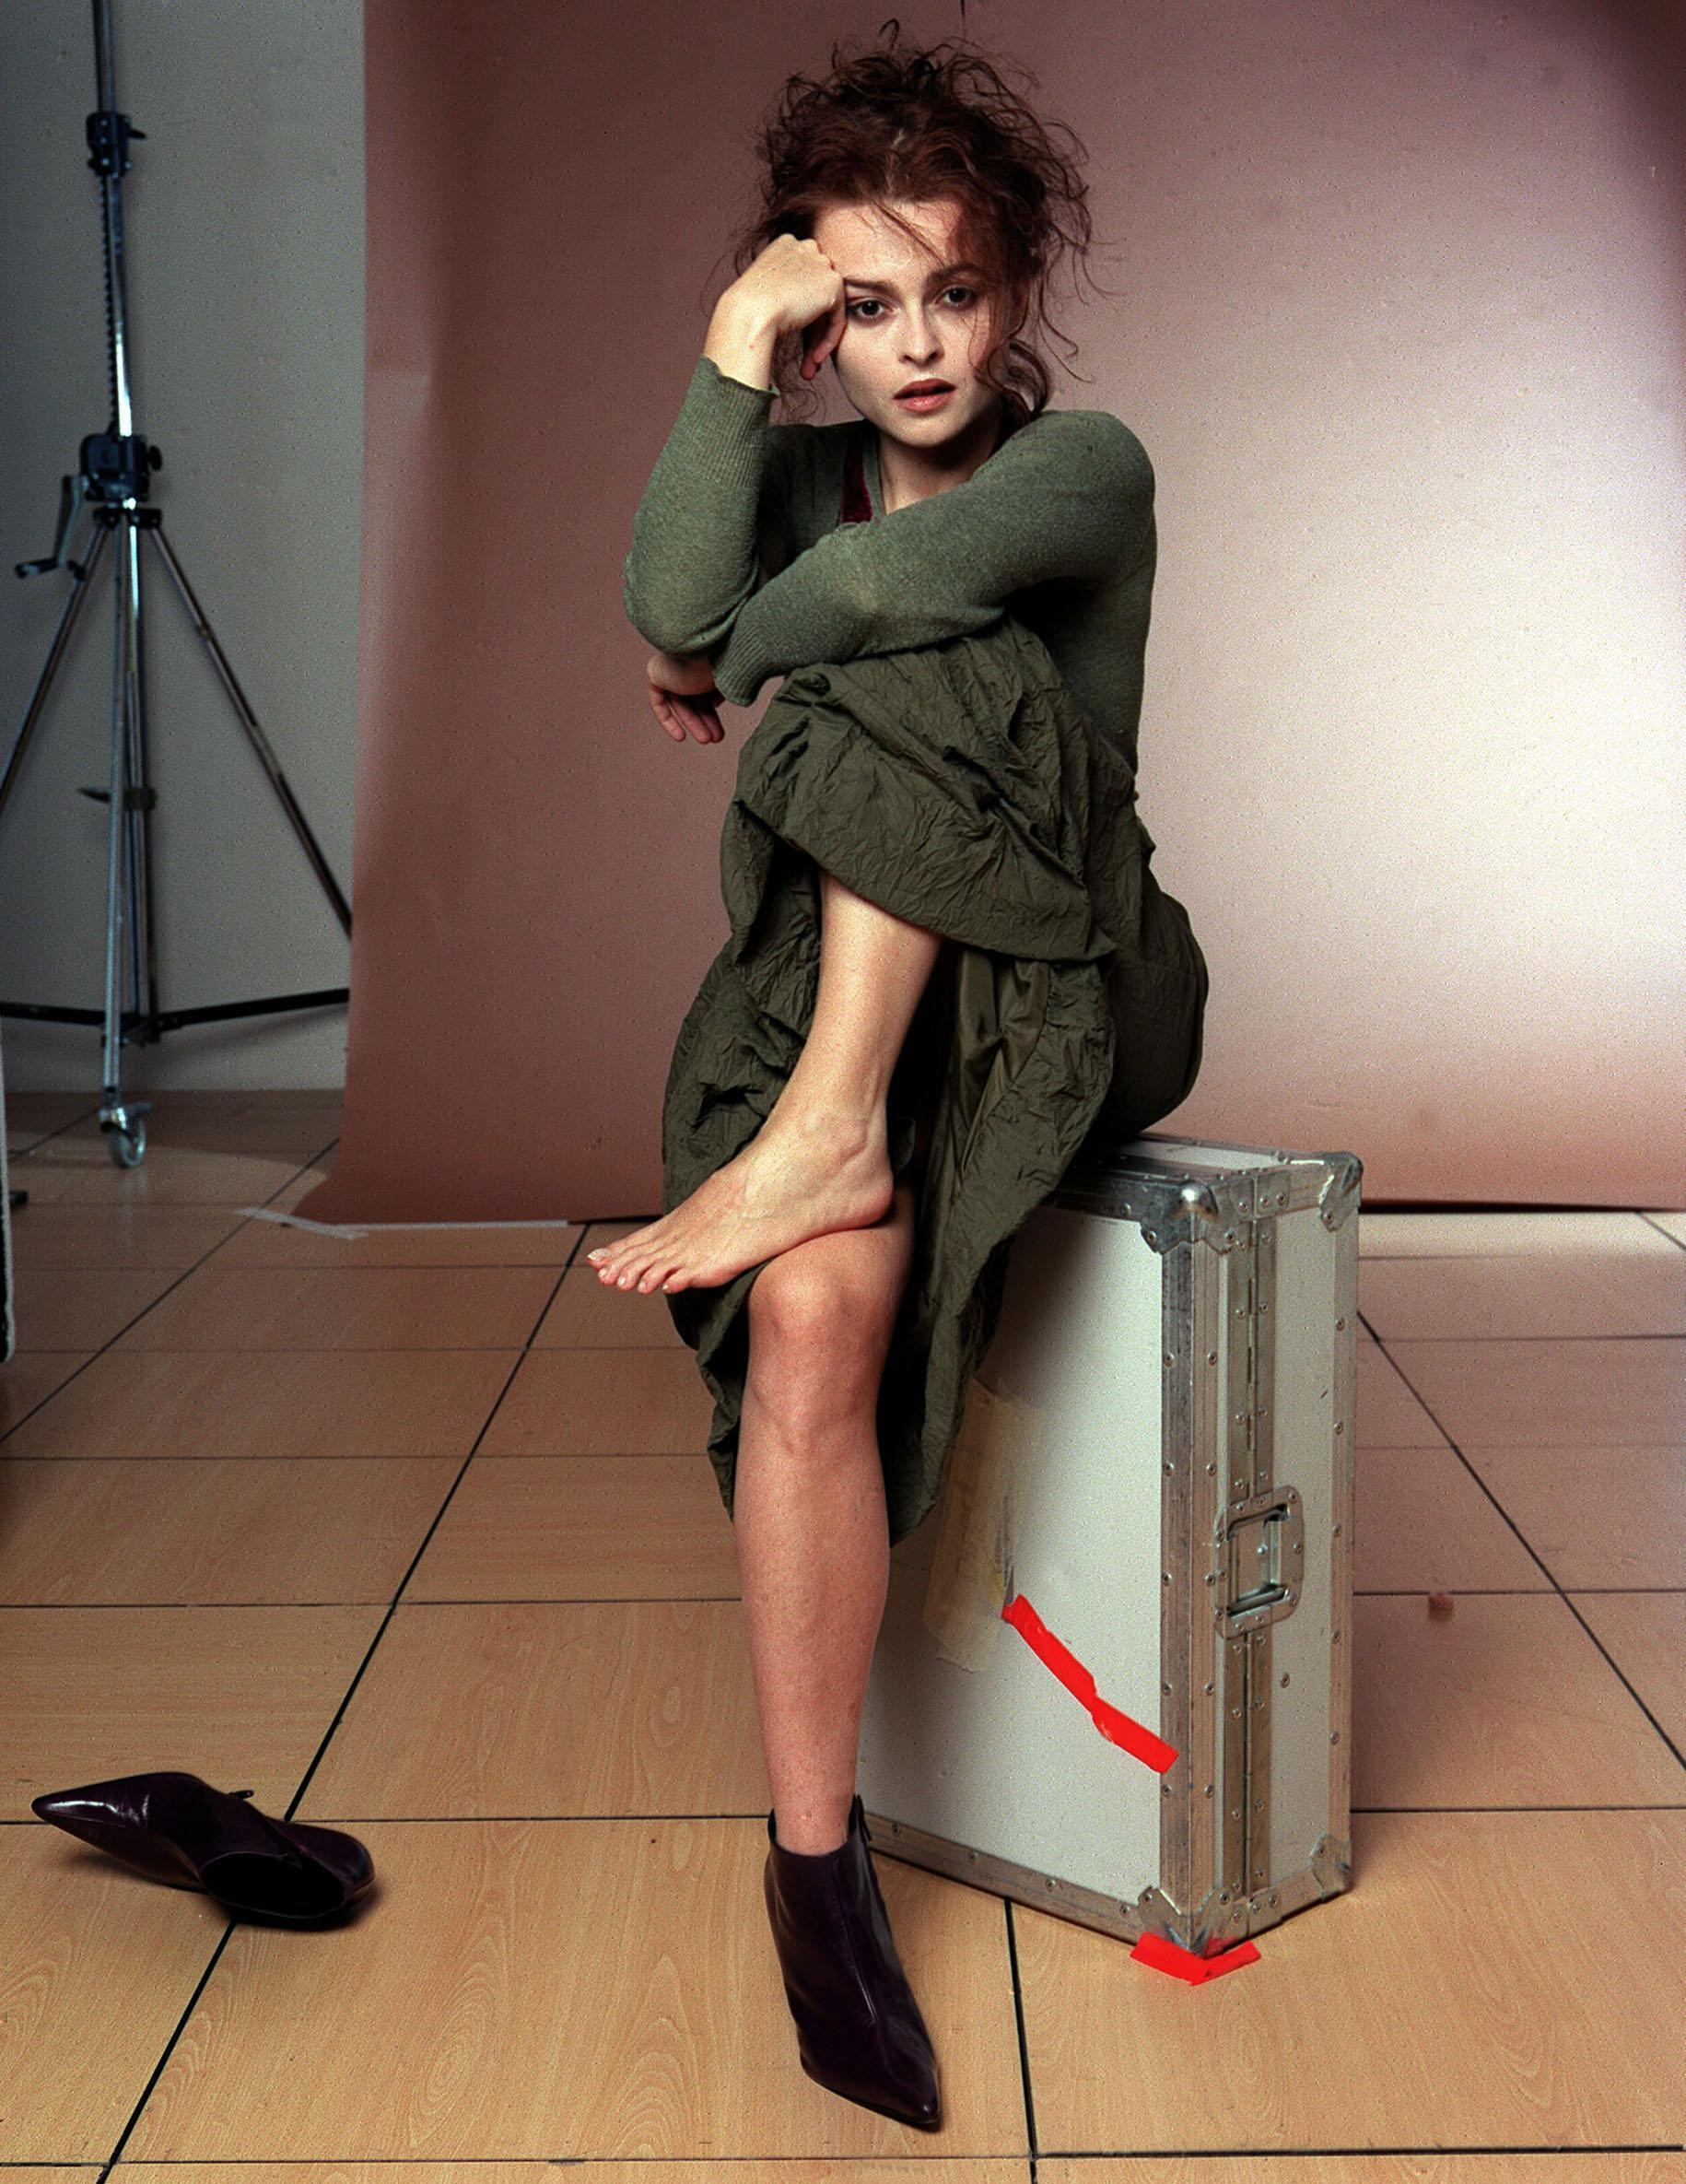 Amazing Helena Bonham Carter Pictures & Backgrounds